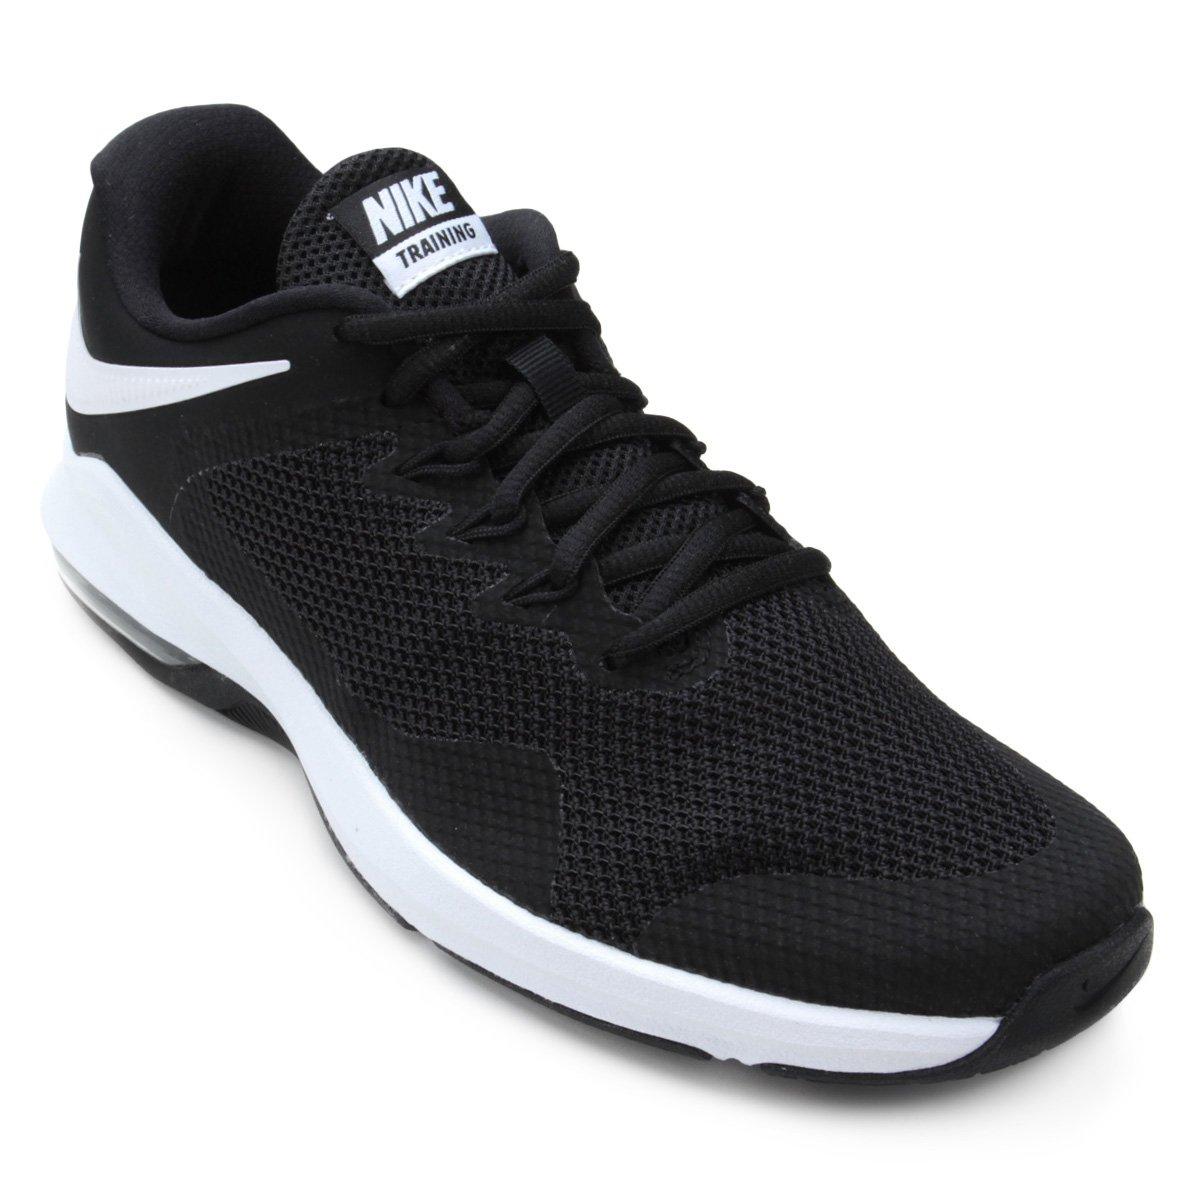 151aa8ab20 Tênis Nike Air Max Alpha Trainer Masculino - Preto e Branco | Shop Timão